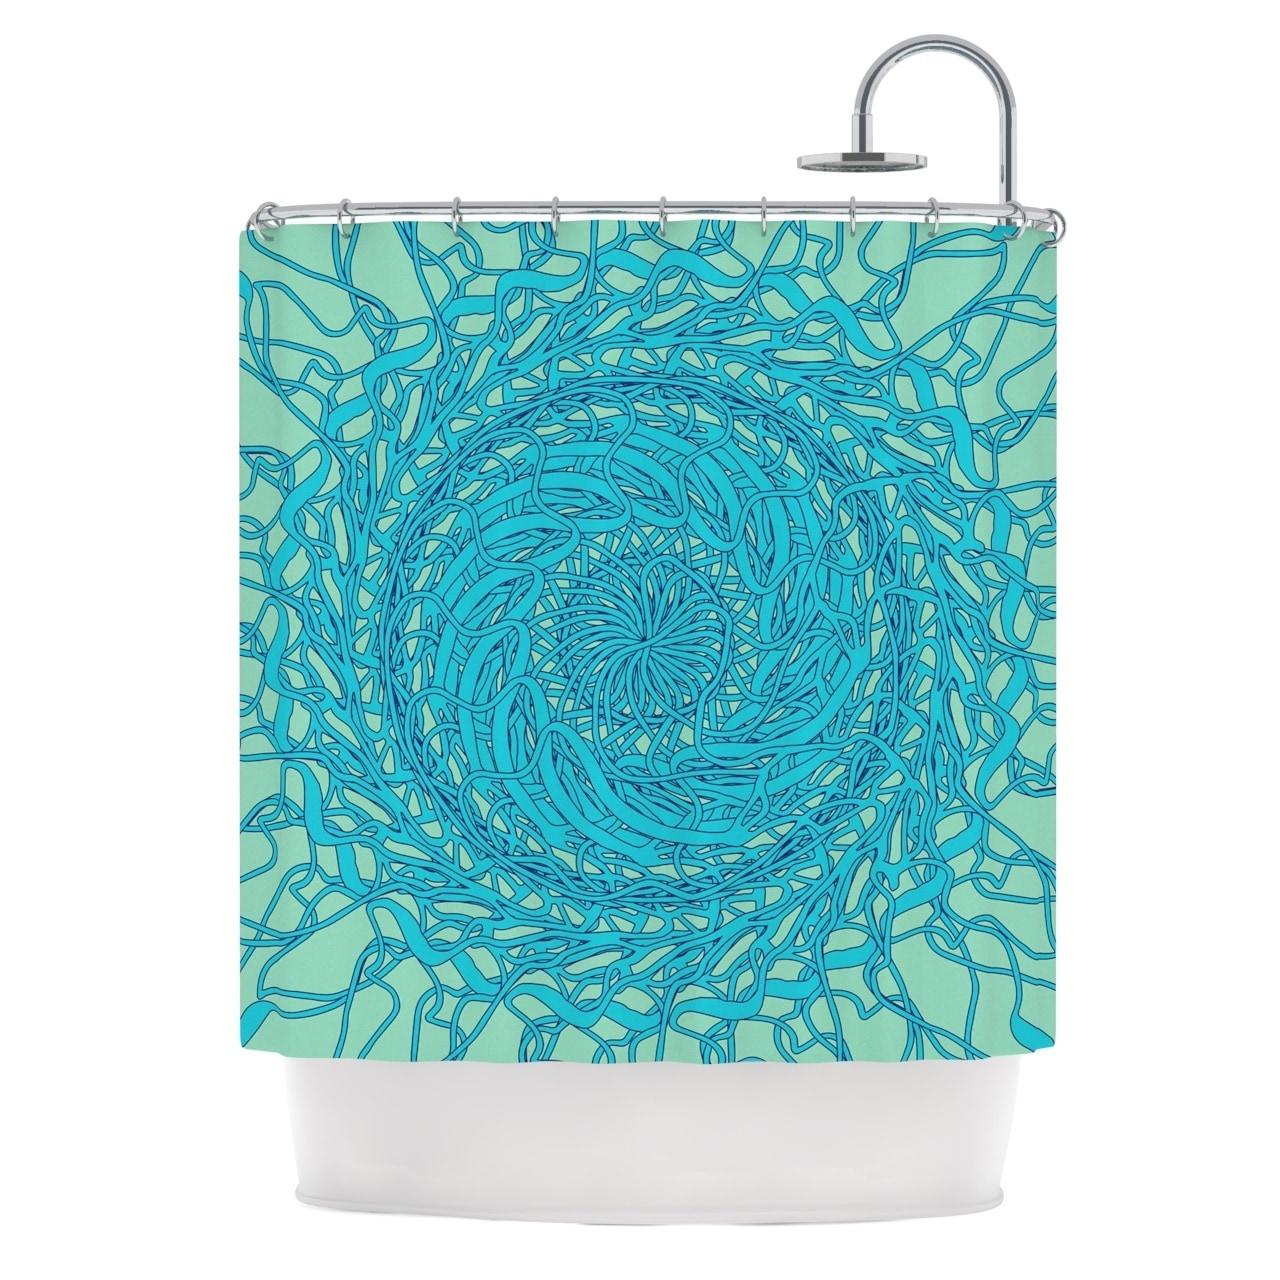 Shop KESS InHouse Patternmuse Mandala Spin Mint Green Blue Shower Curtain 69x70